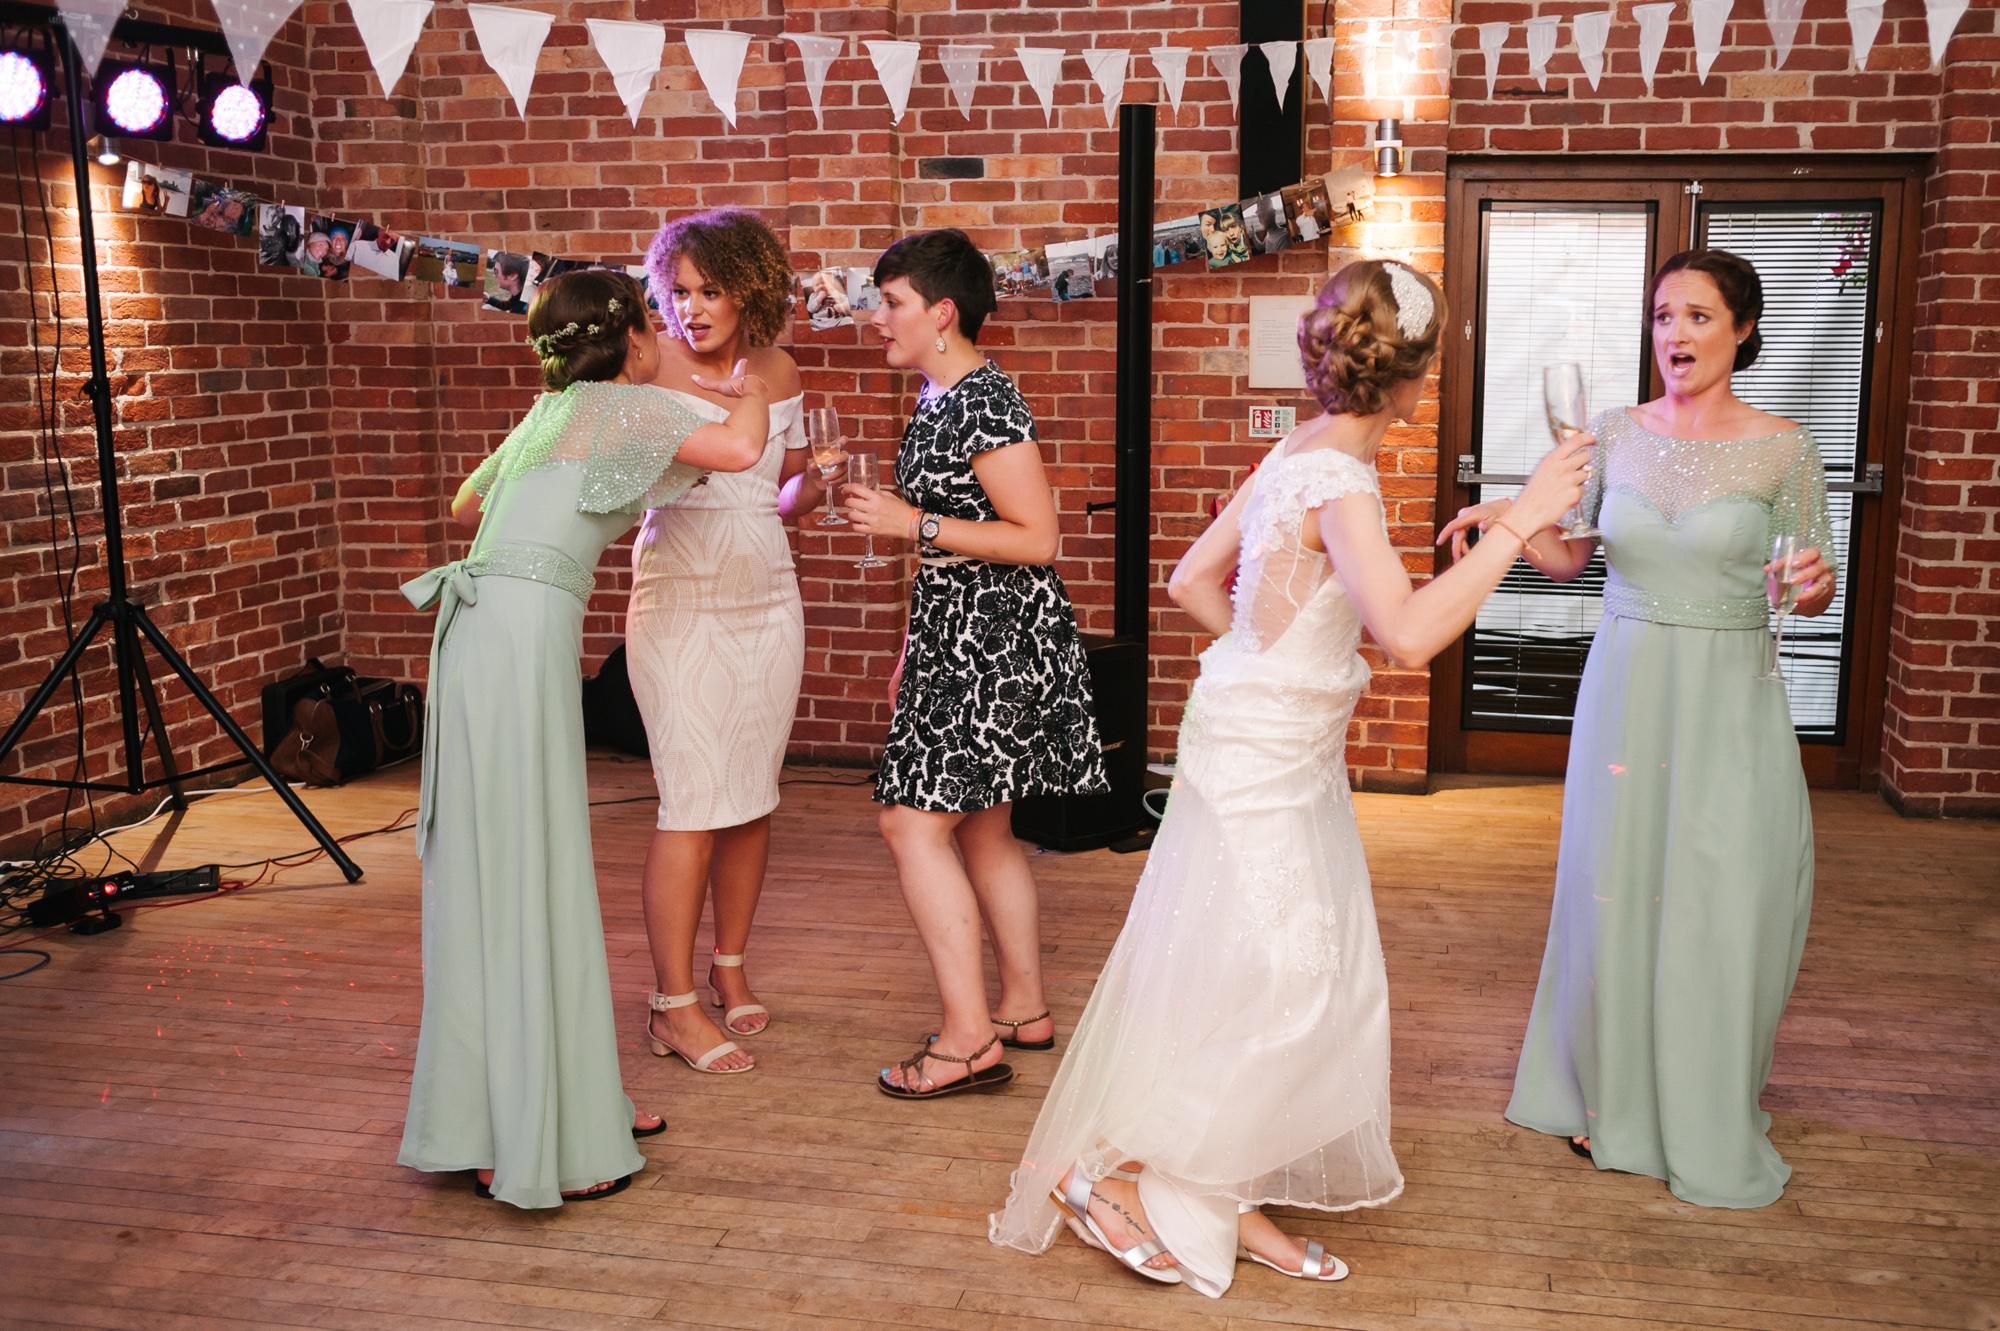 Cricket Club Wedding Tea Party Eversholt Bedfordshire-92